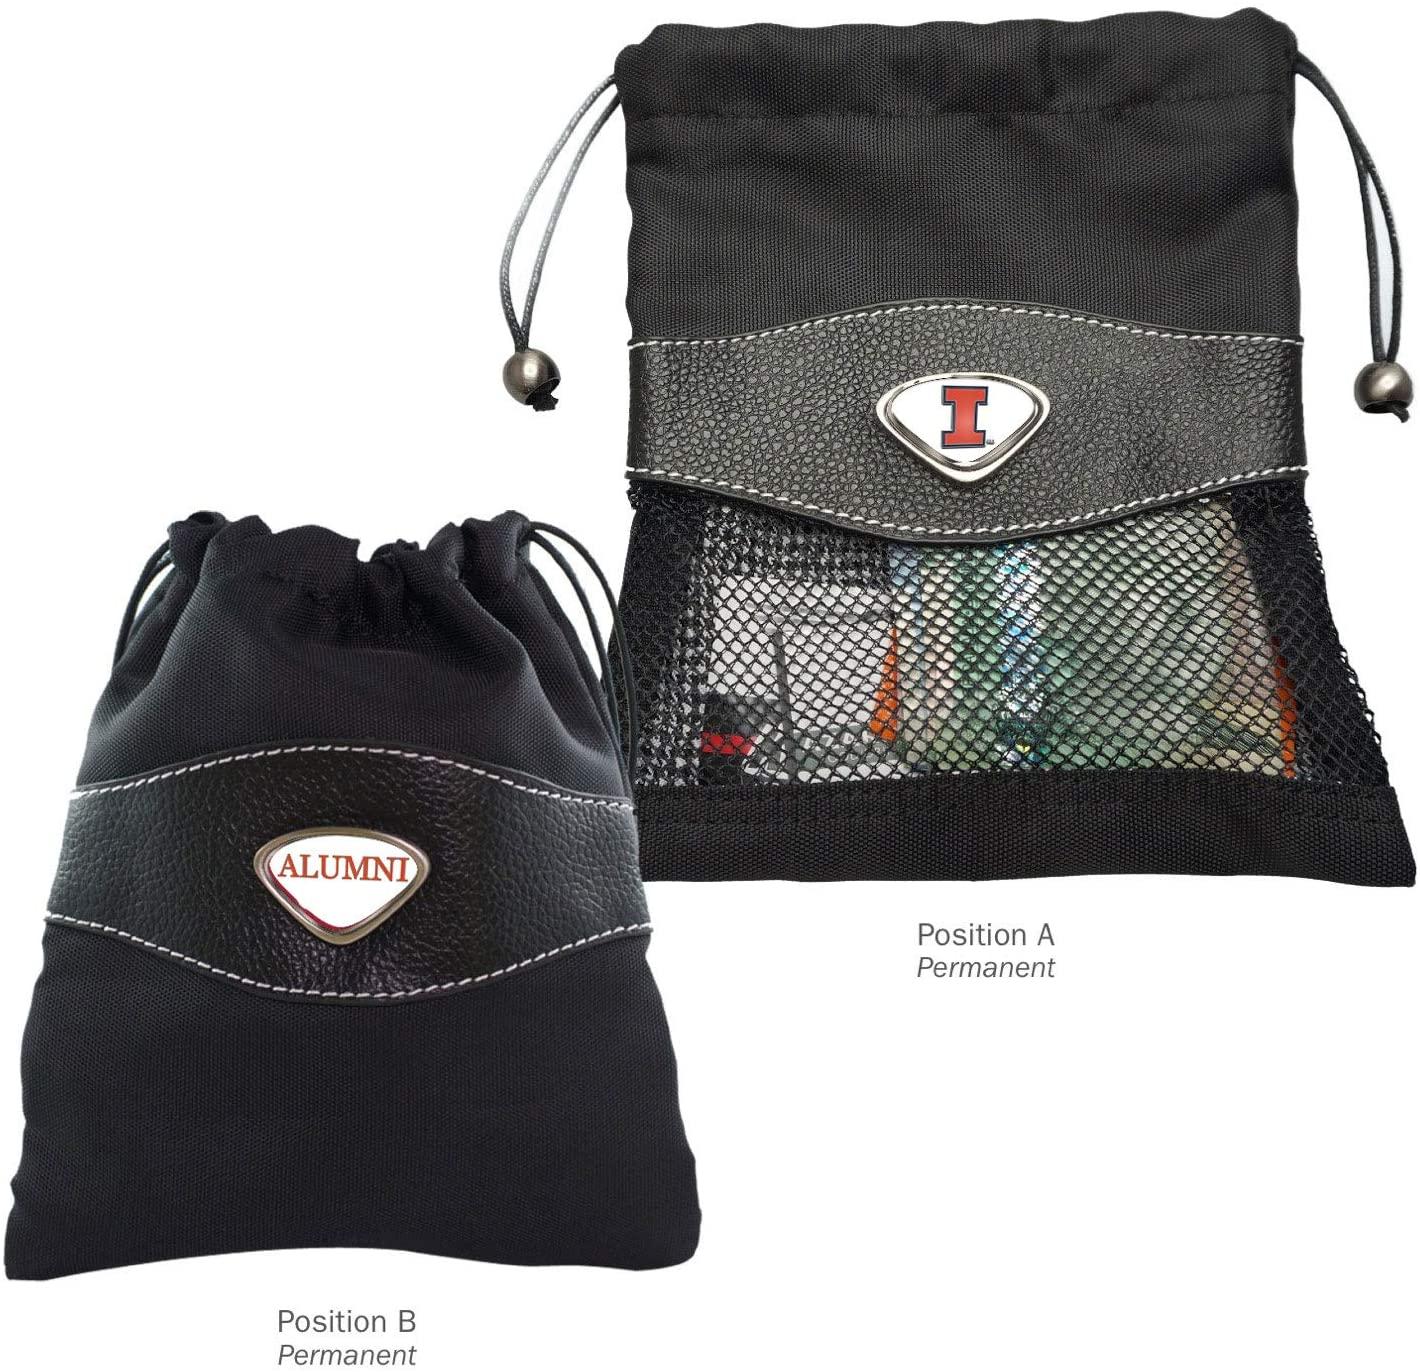 AdSpec NCAA Illinois Illini Collegiate Valuables BagCollegiate Valuables Bag, Black, One Size